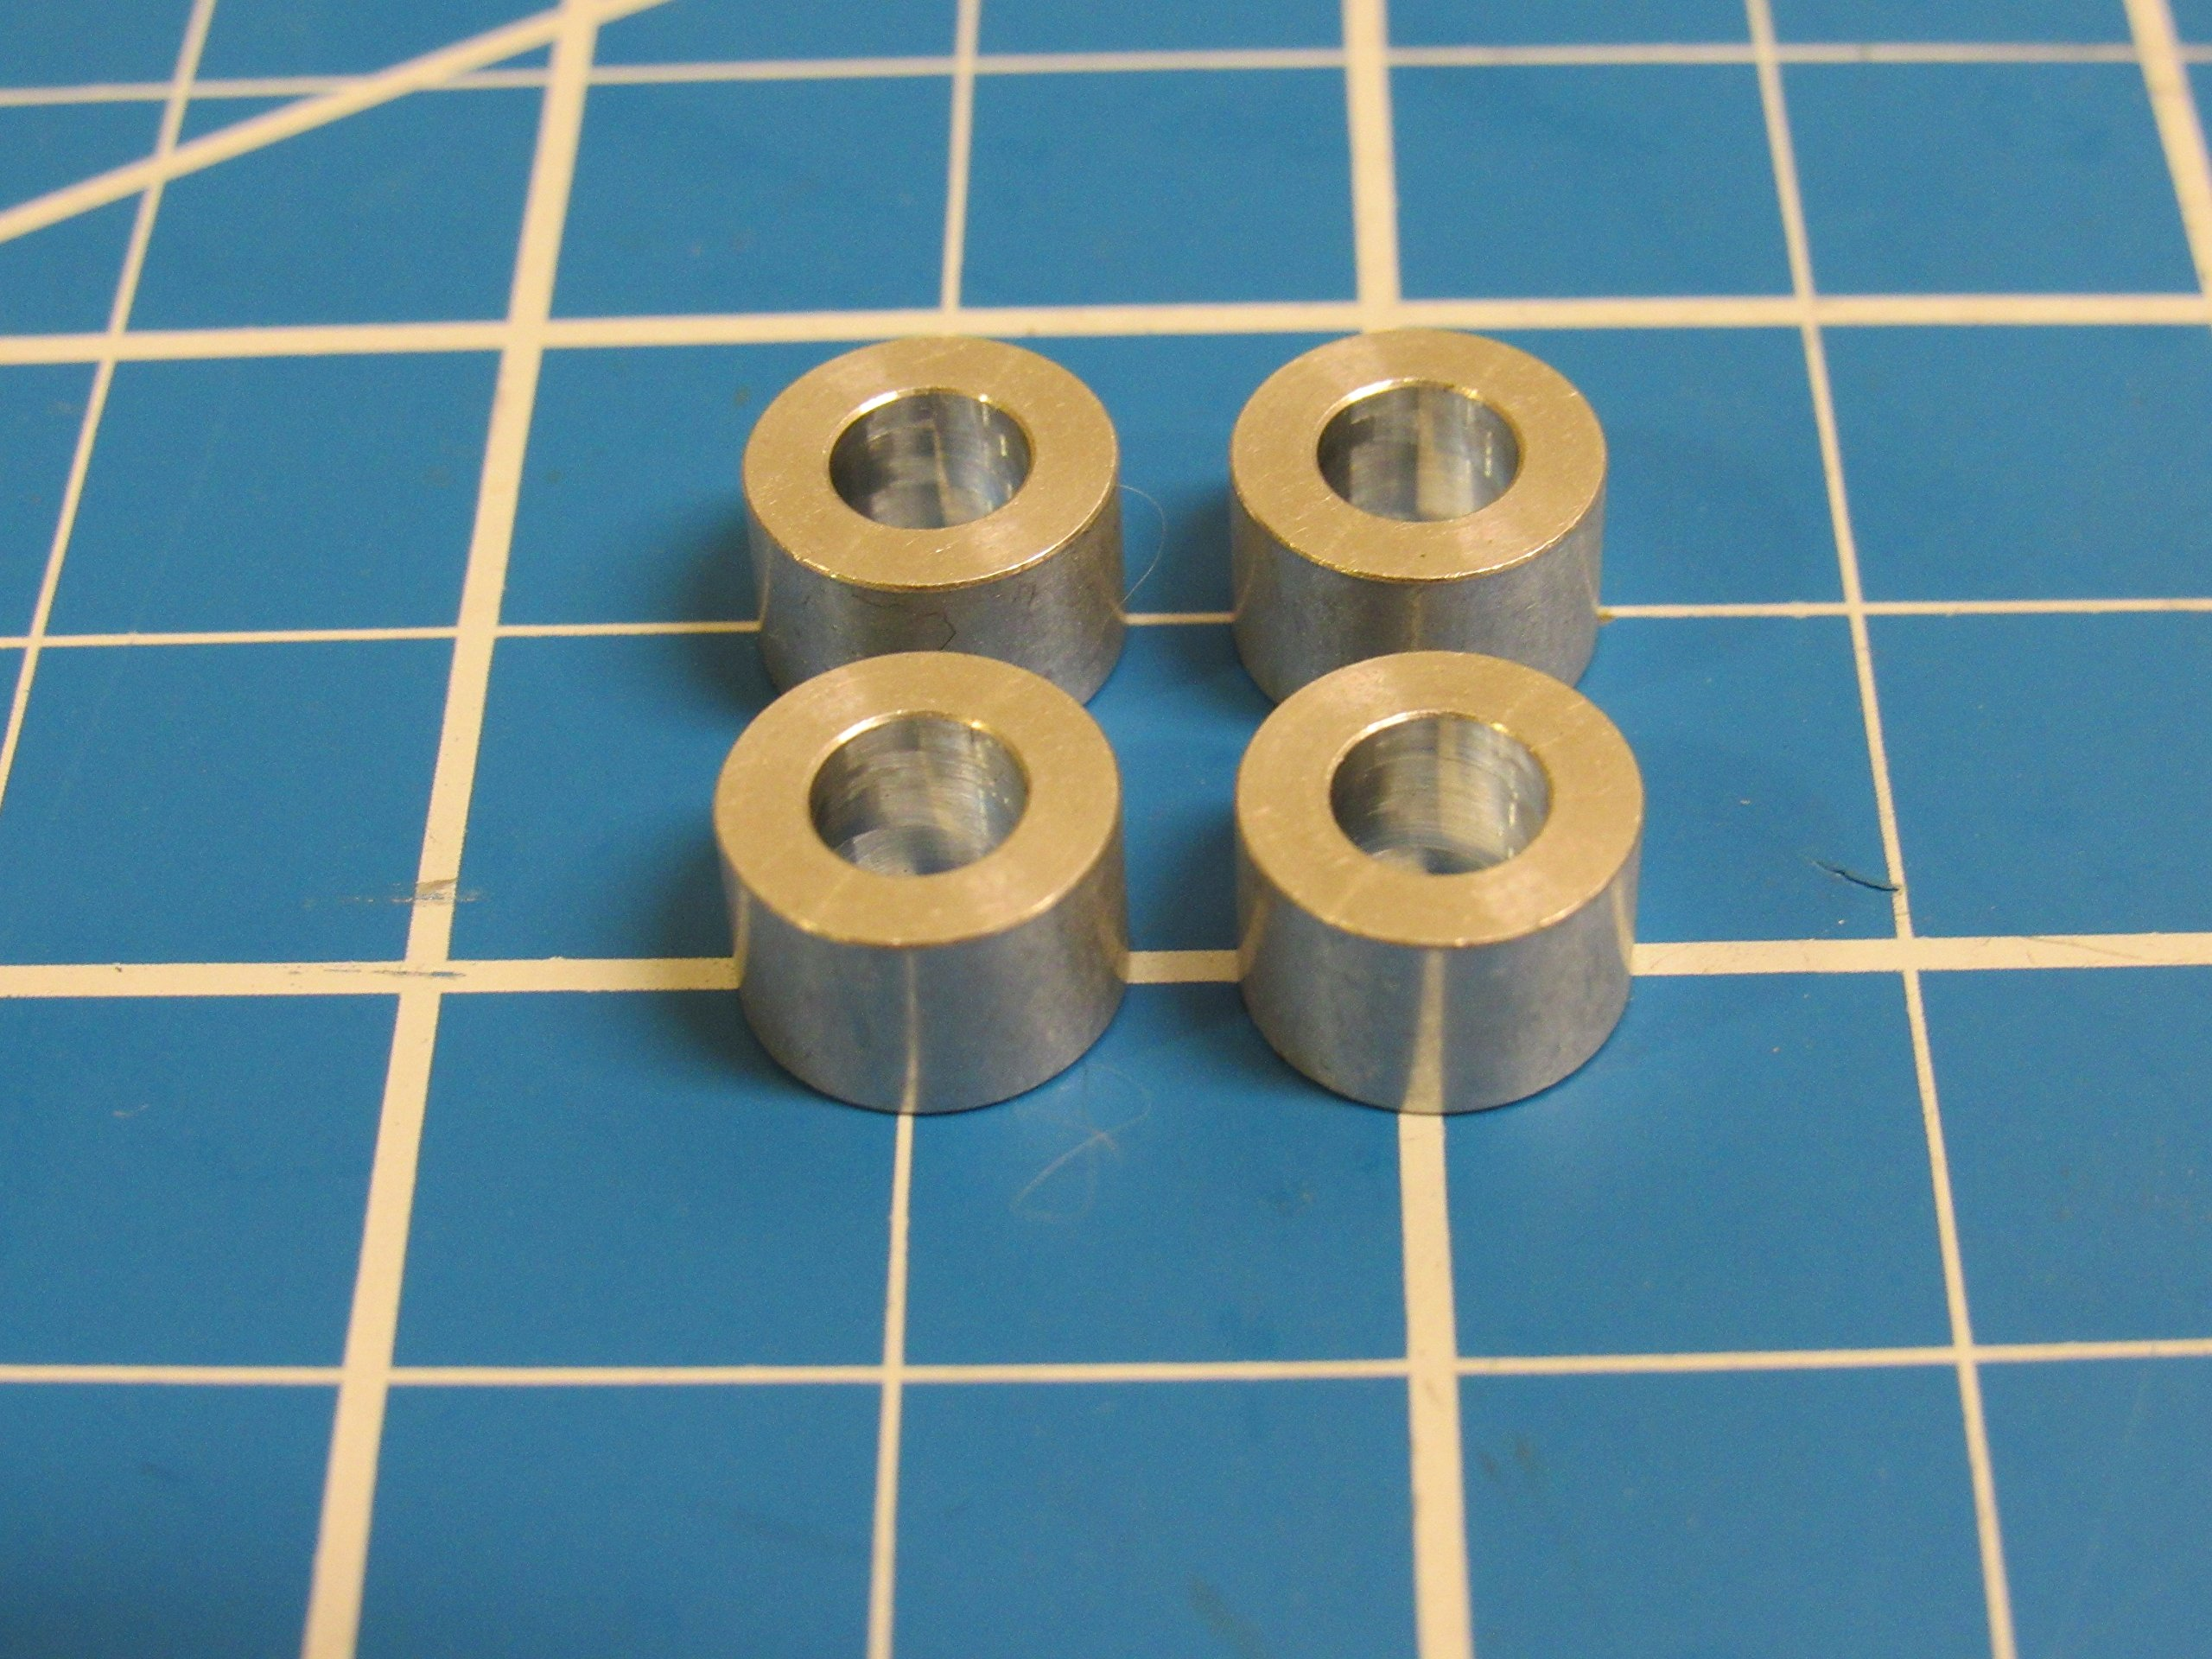 Aluminum Spacer M5, 1/4in Long, 5.1mm ID x 10mm OD x 6.35mm L (50 Pack)